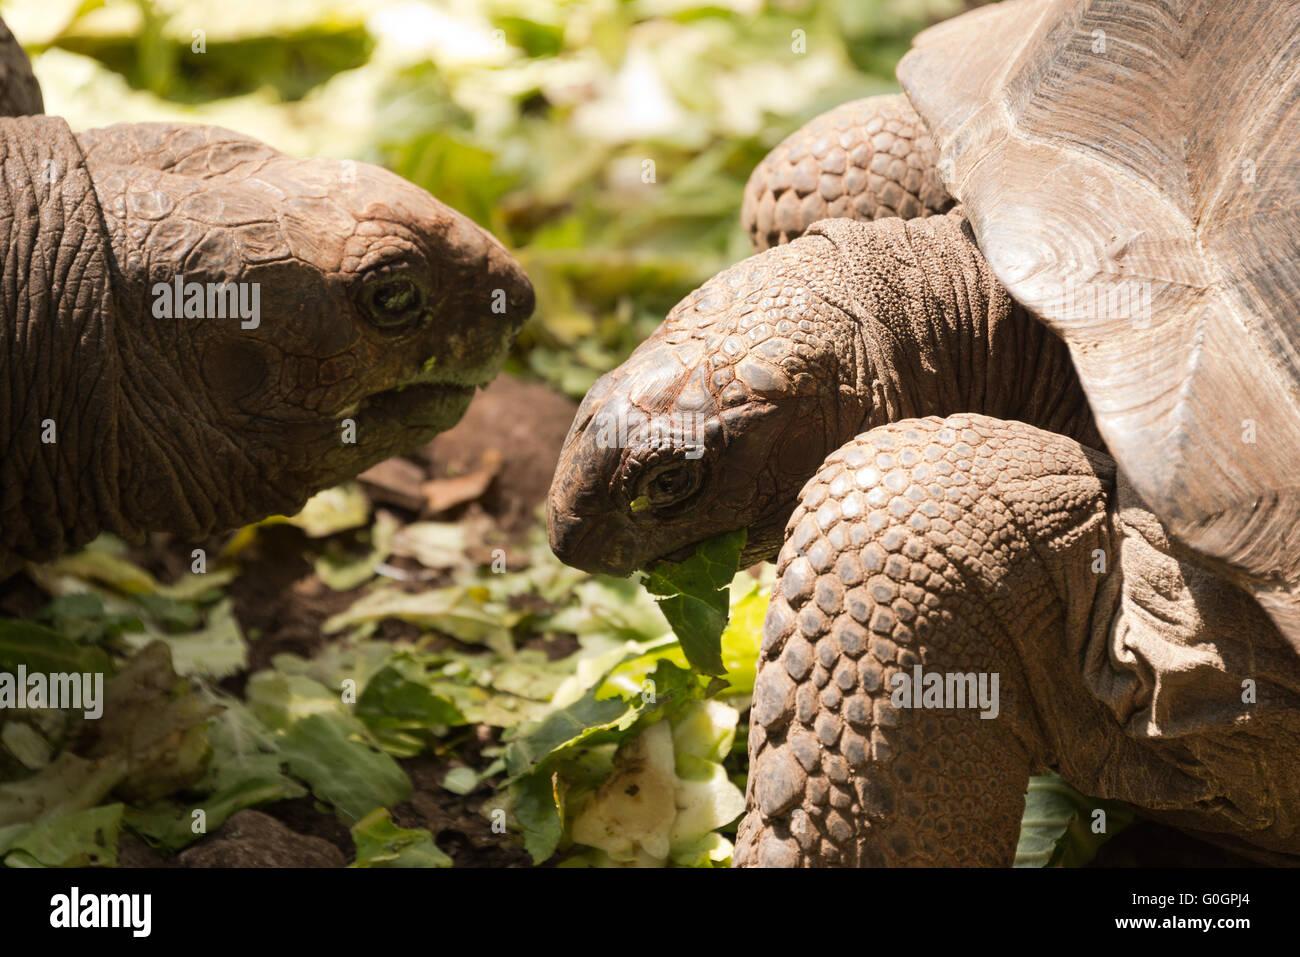 Aldabra giant tortoise - Stock Image